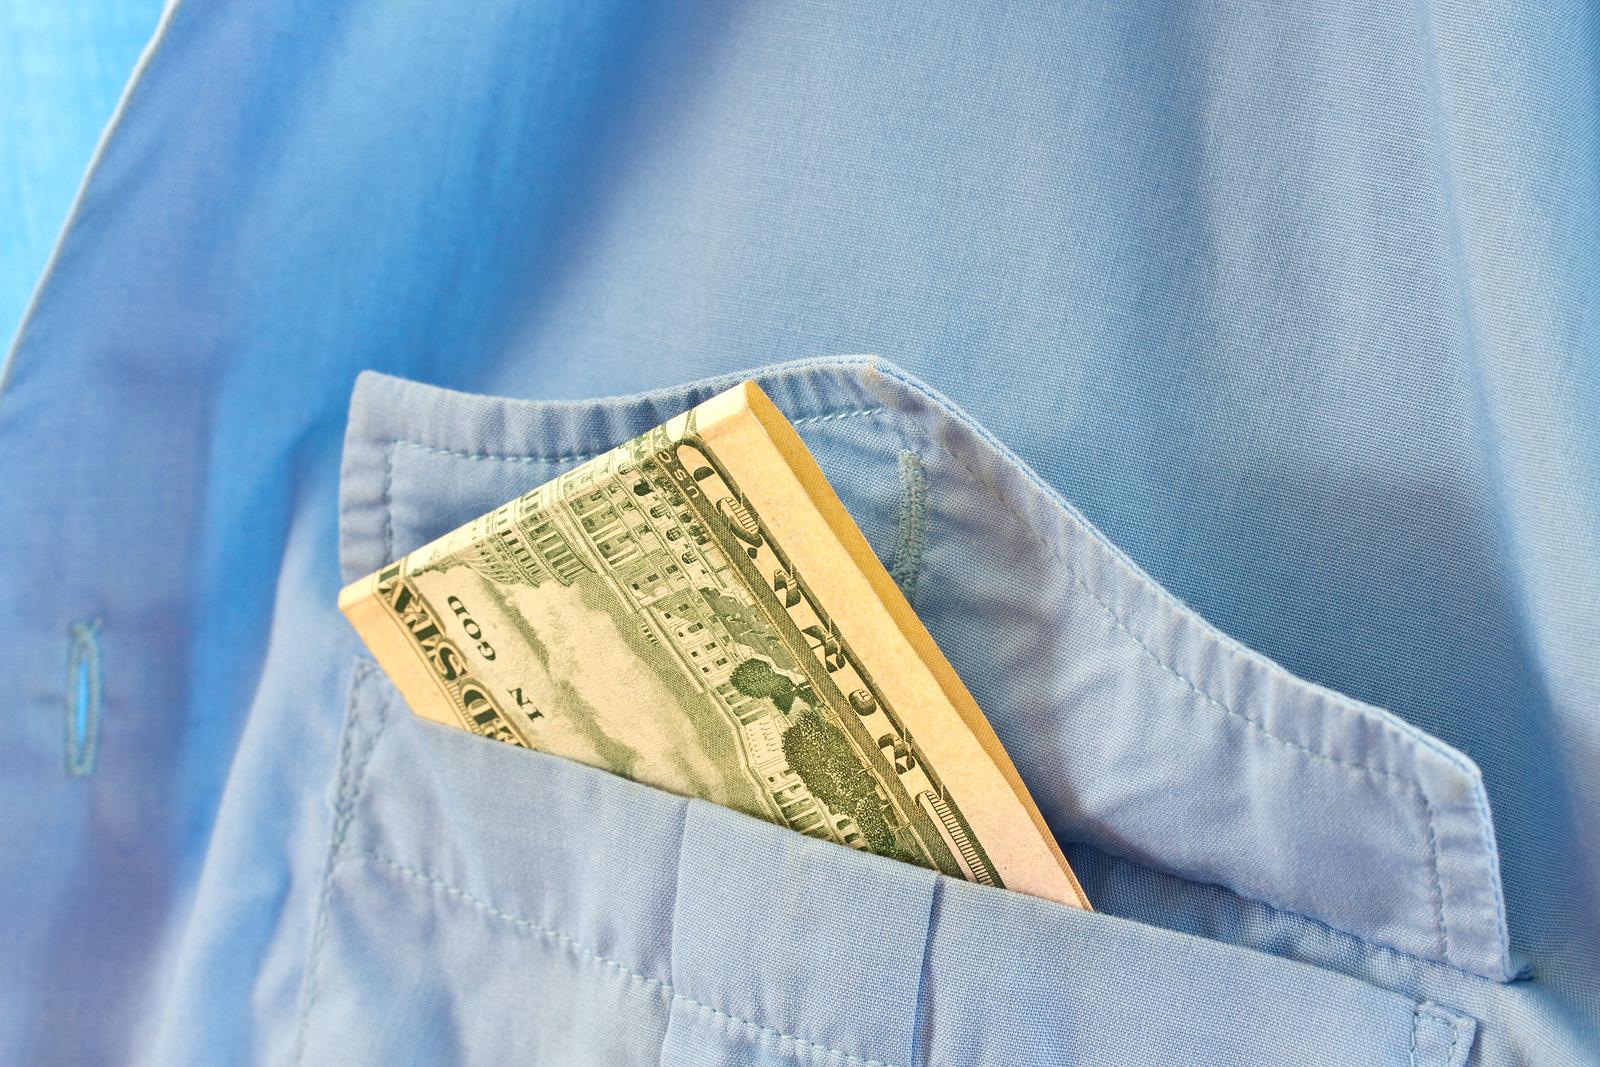 Employee with Stolen Cash